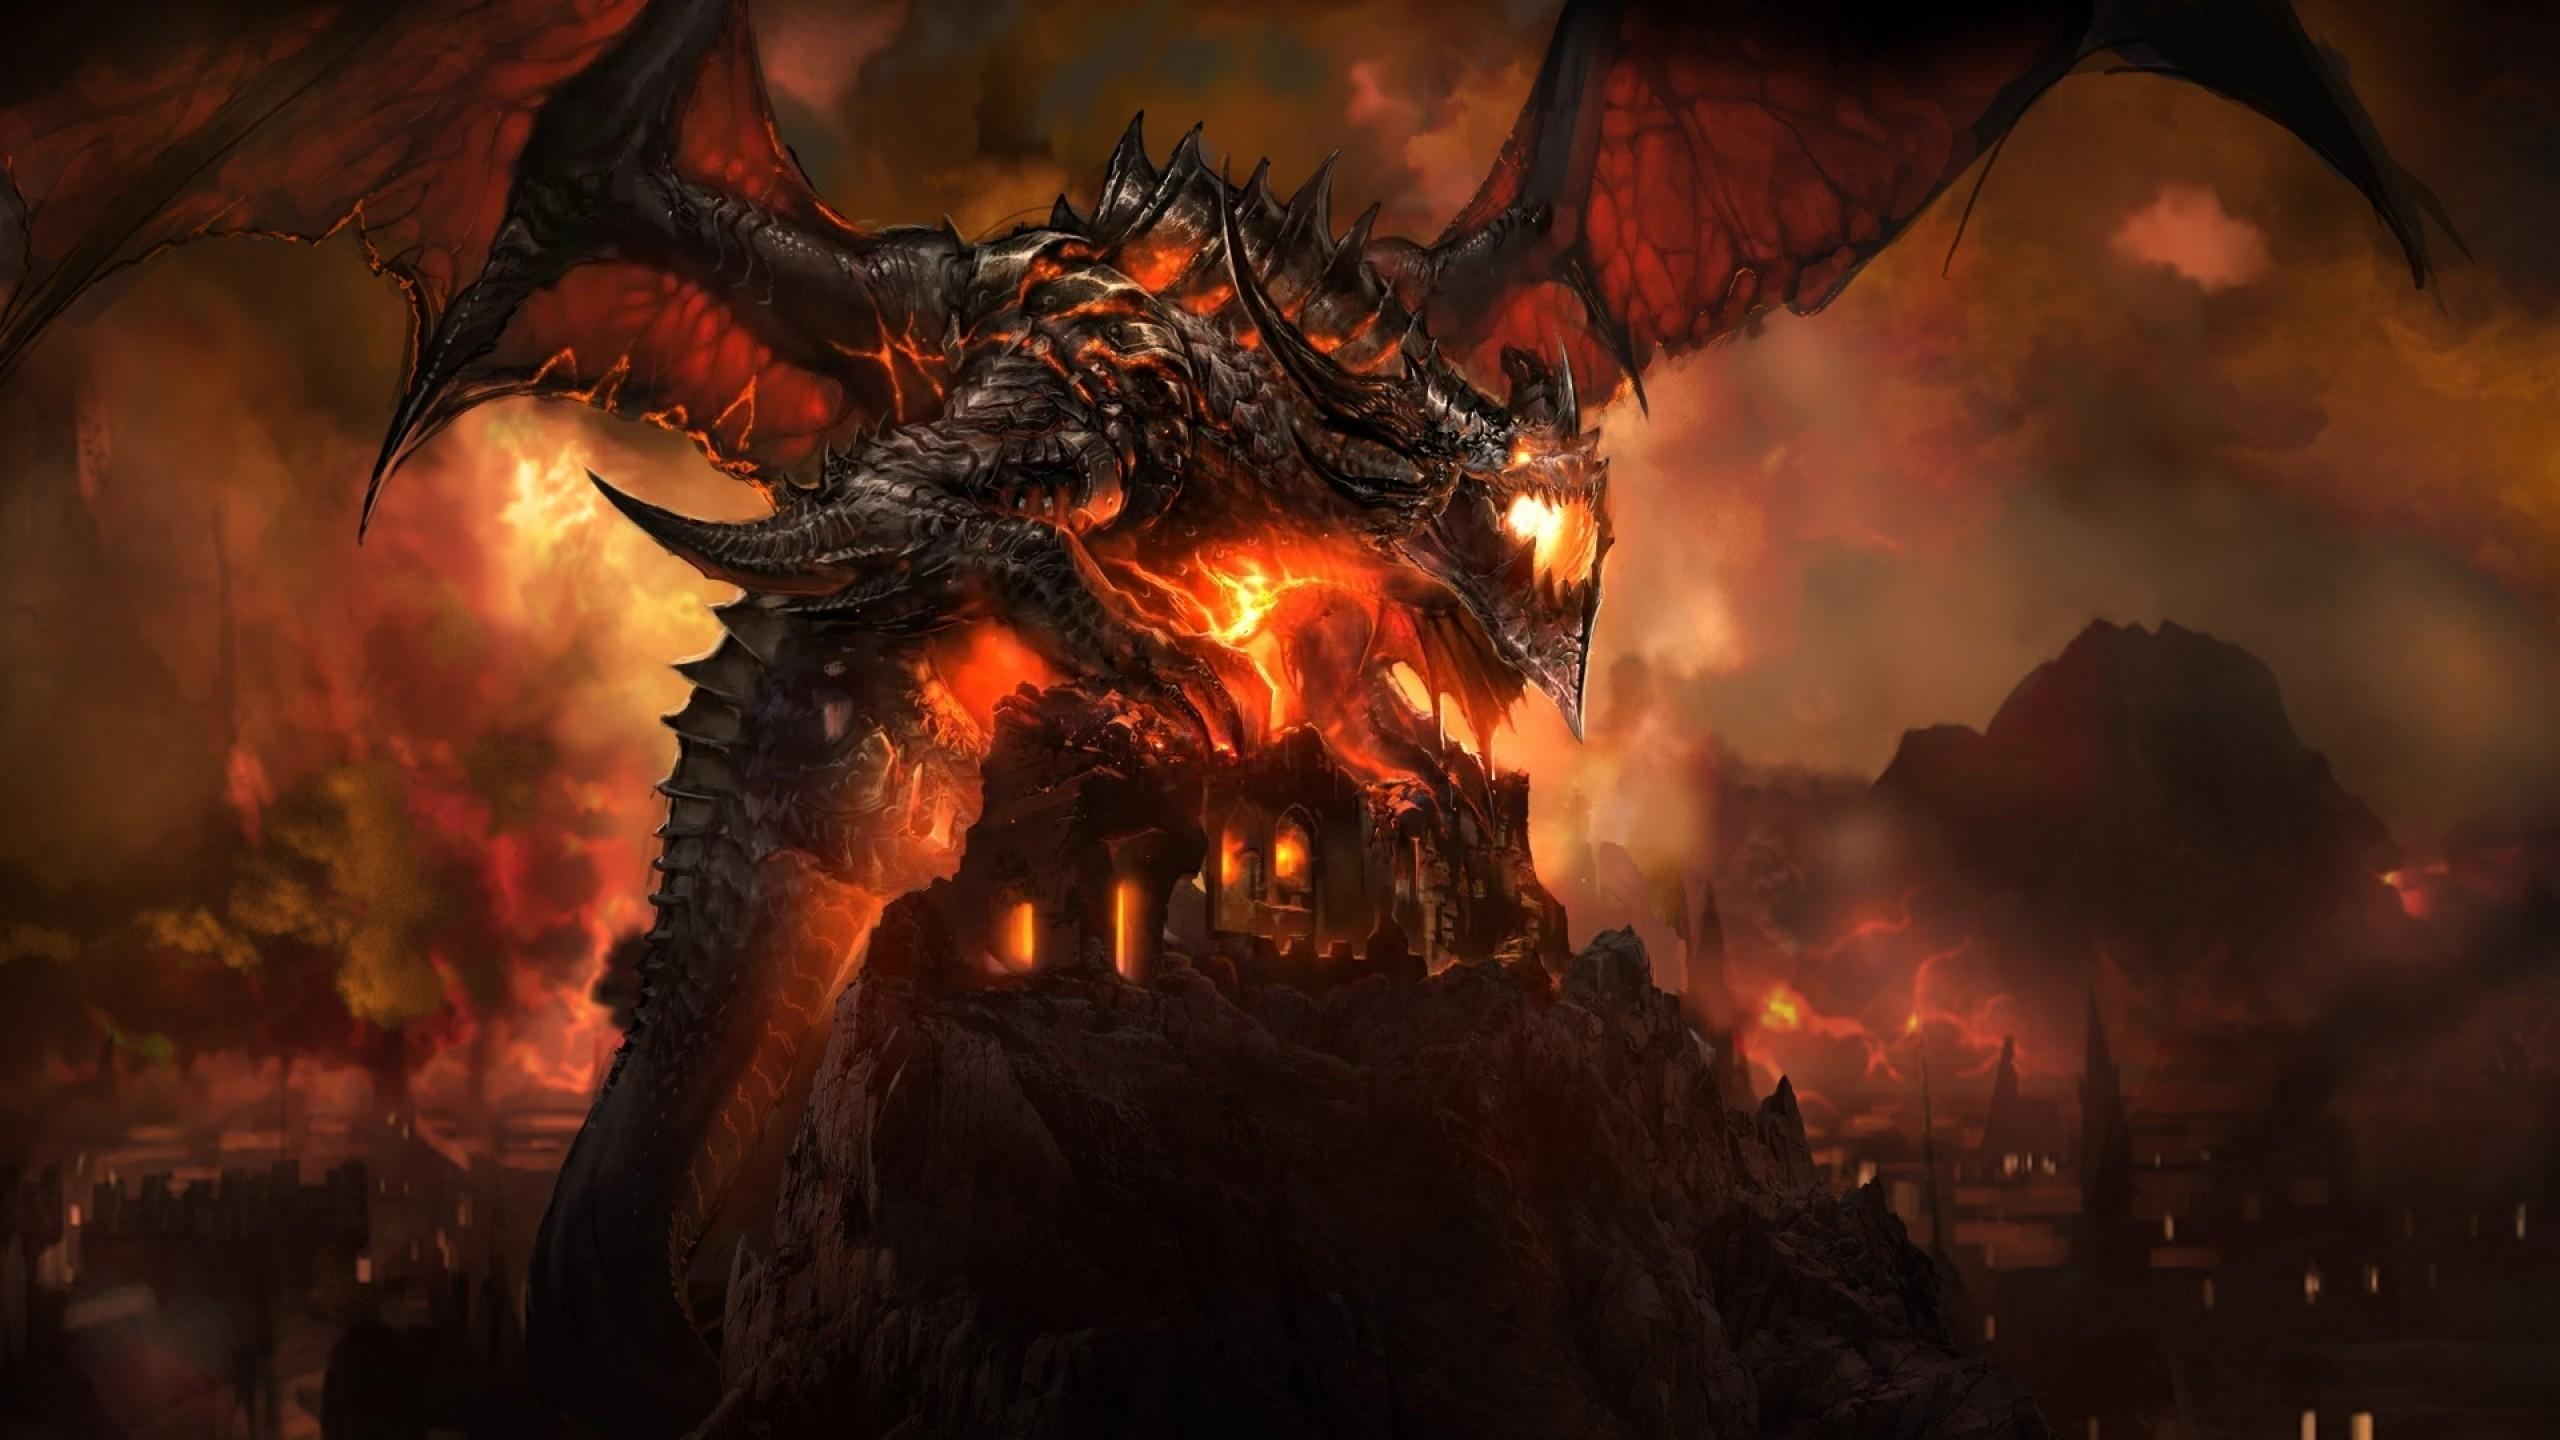 cool fire dragons wallpaper - 1413282